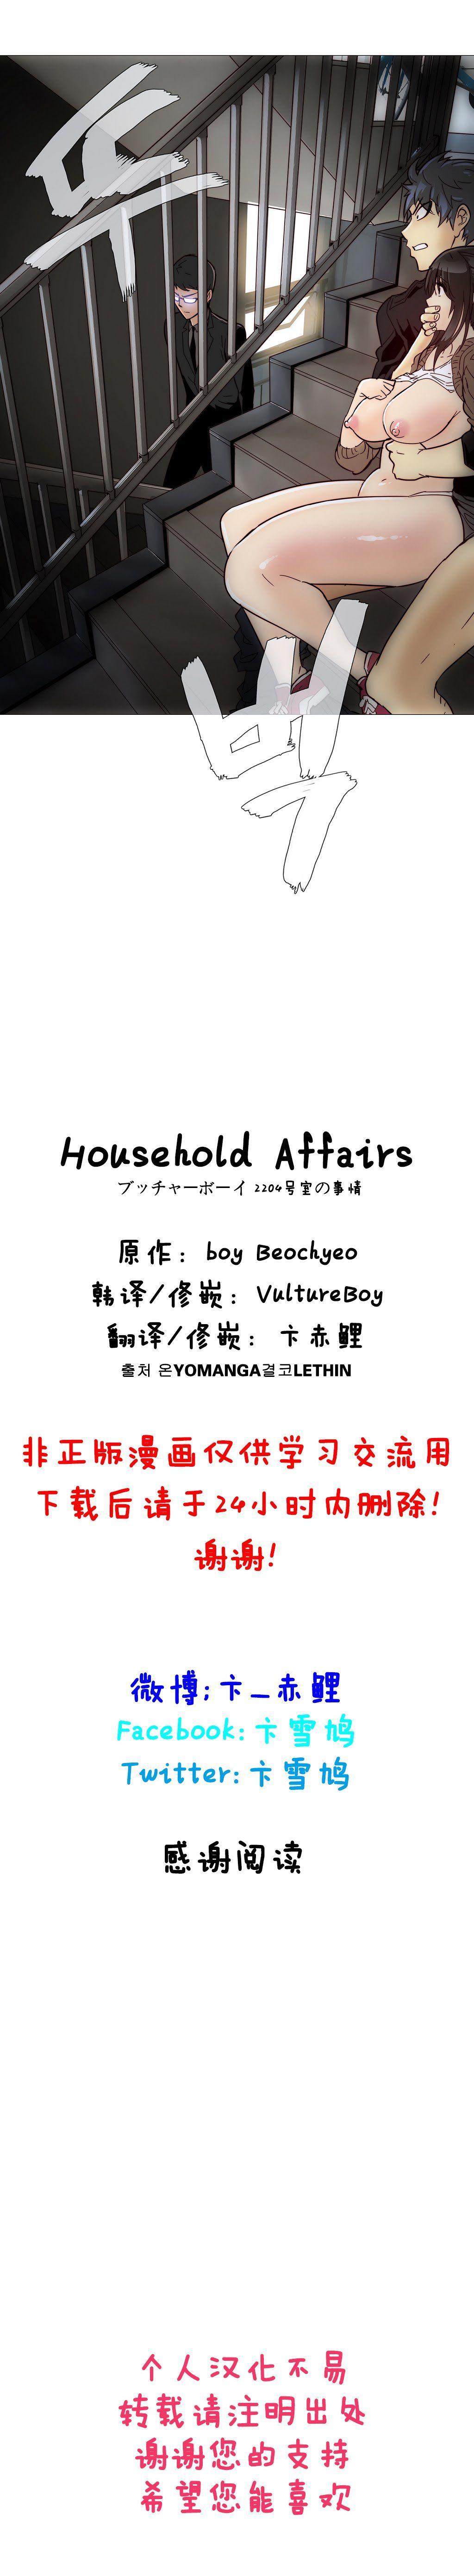 HouseHold Affairs 【卞赤鲤汉化】1~15话 145